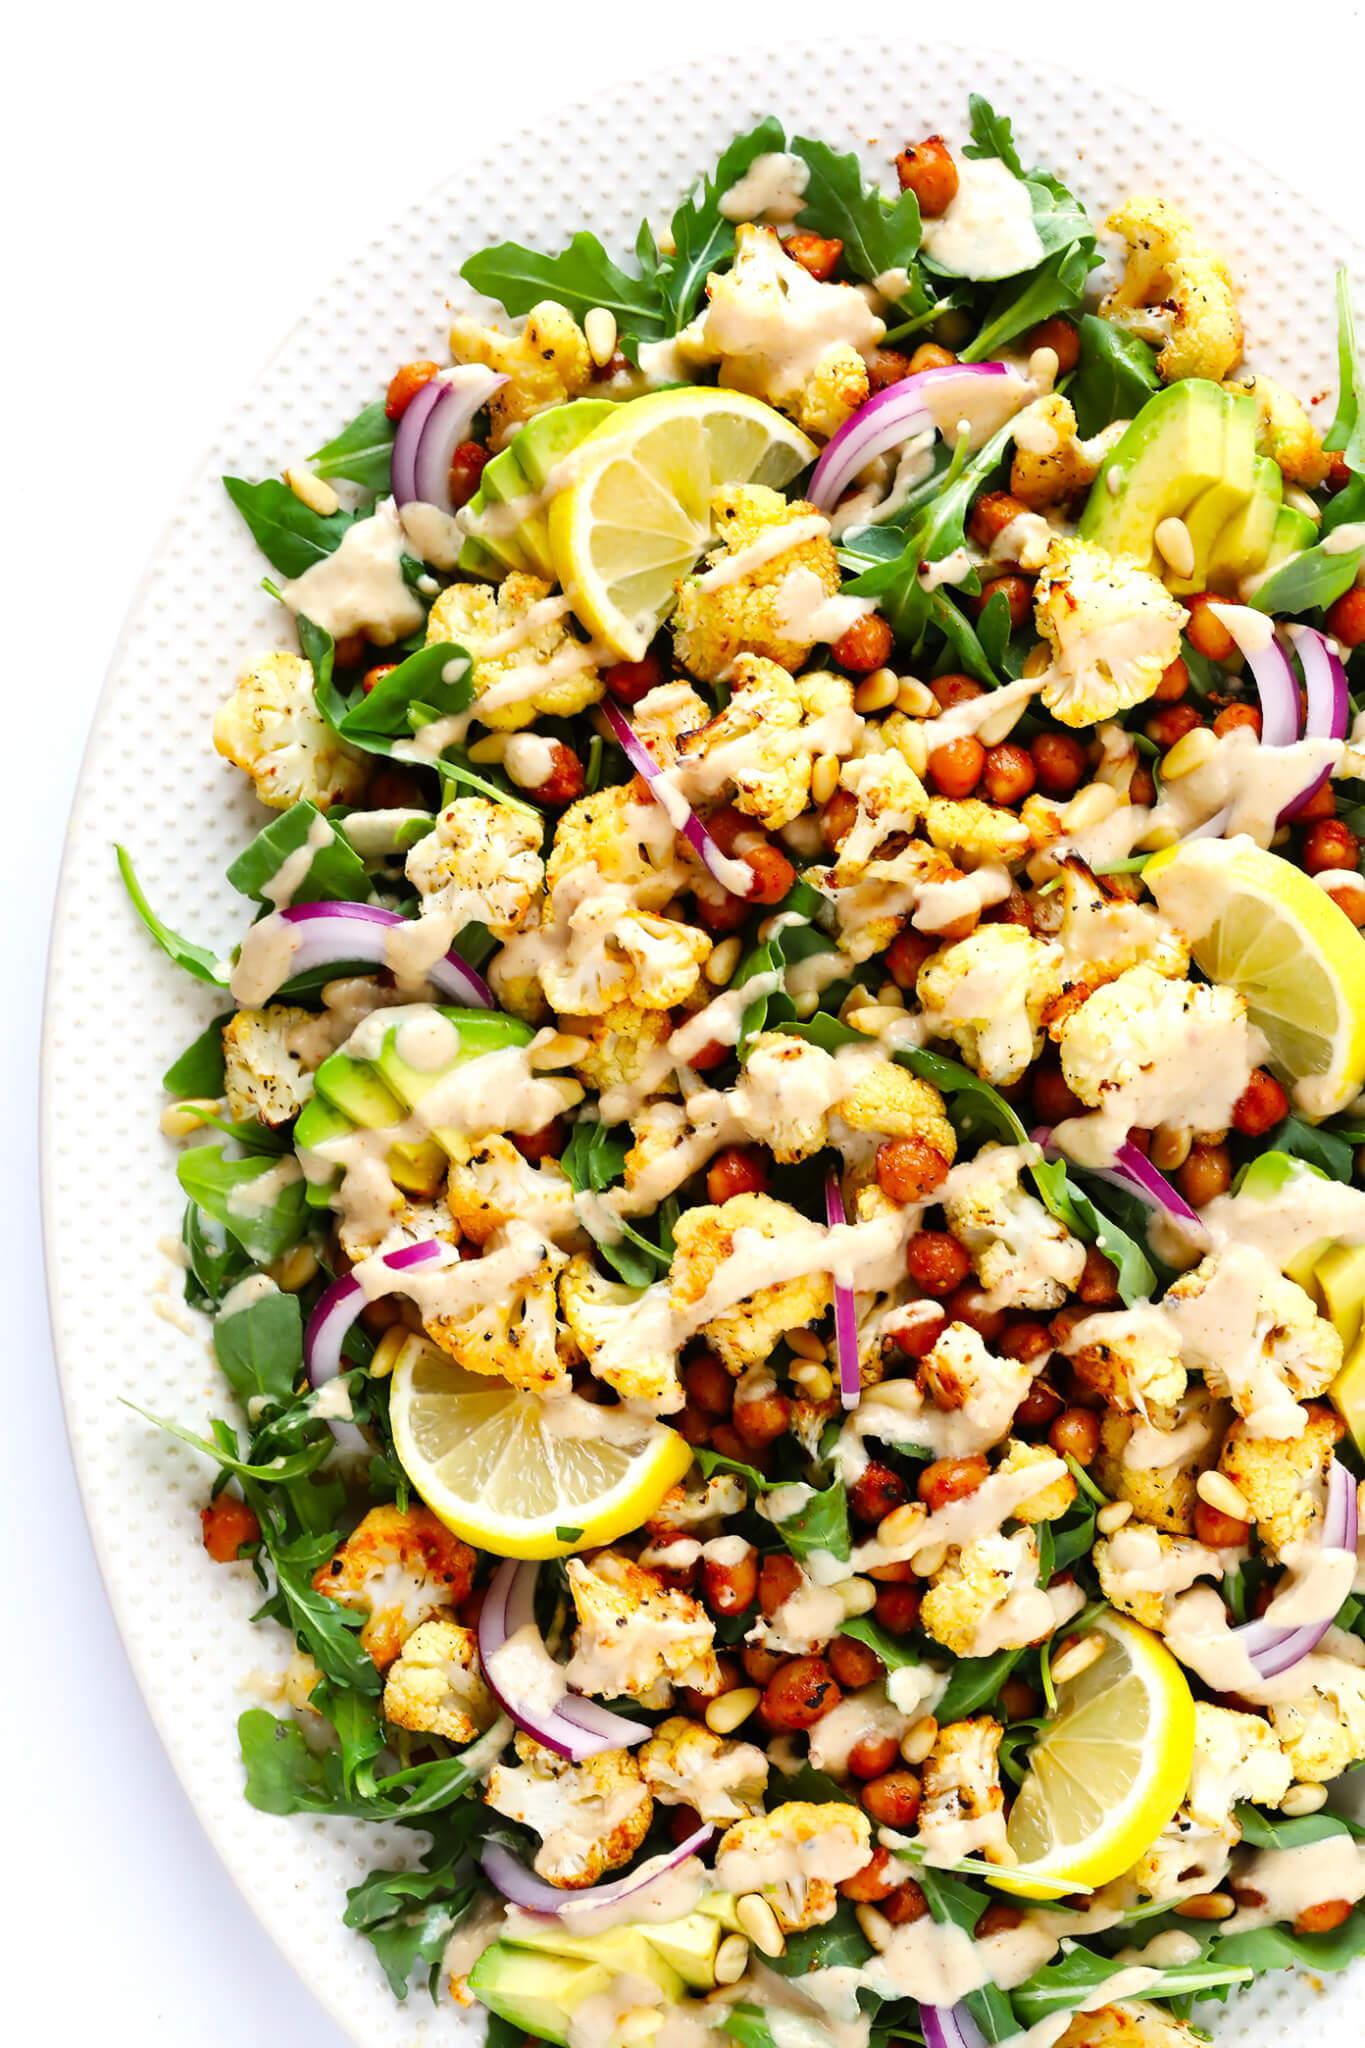 Roasted Cauliflower, Chickpea and Arugula Salad Recipe with Tahini Dressing